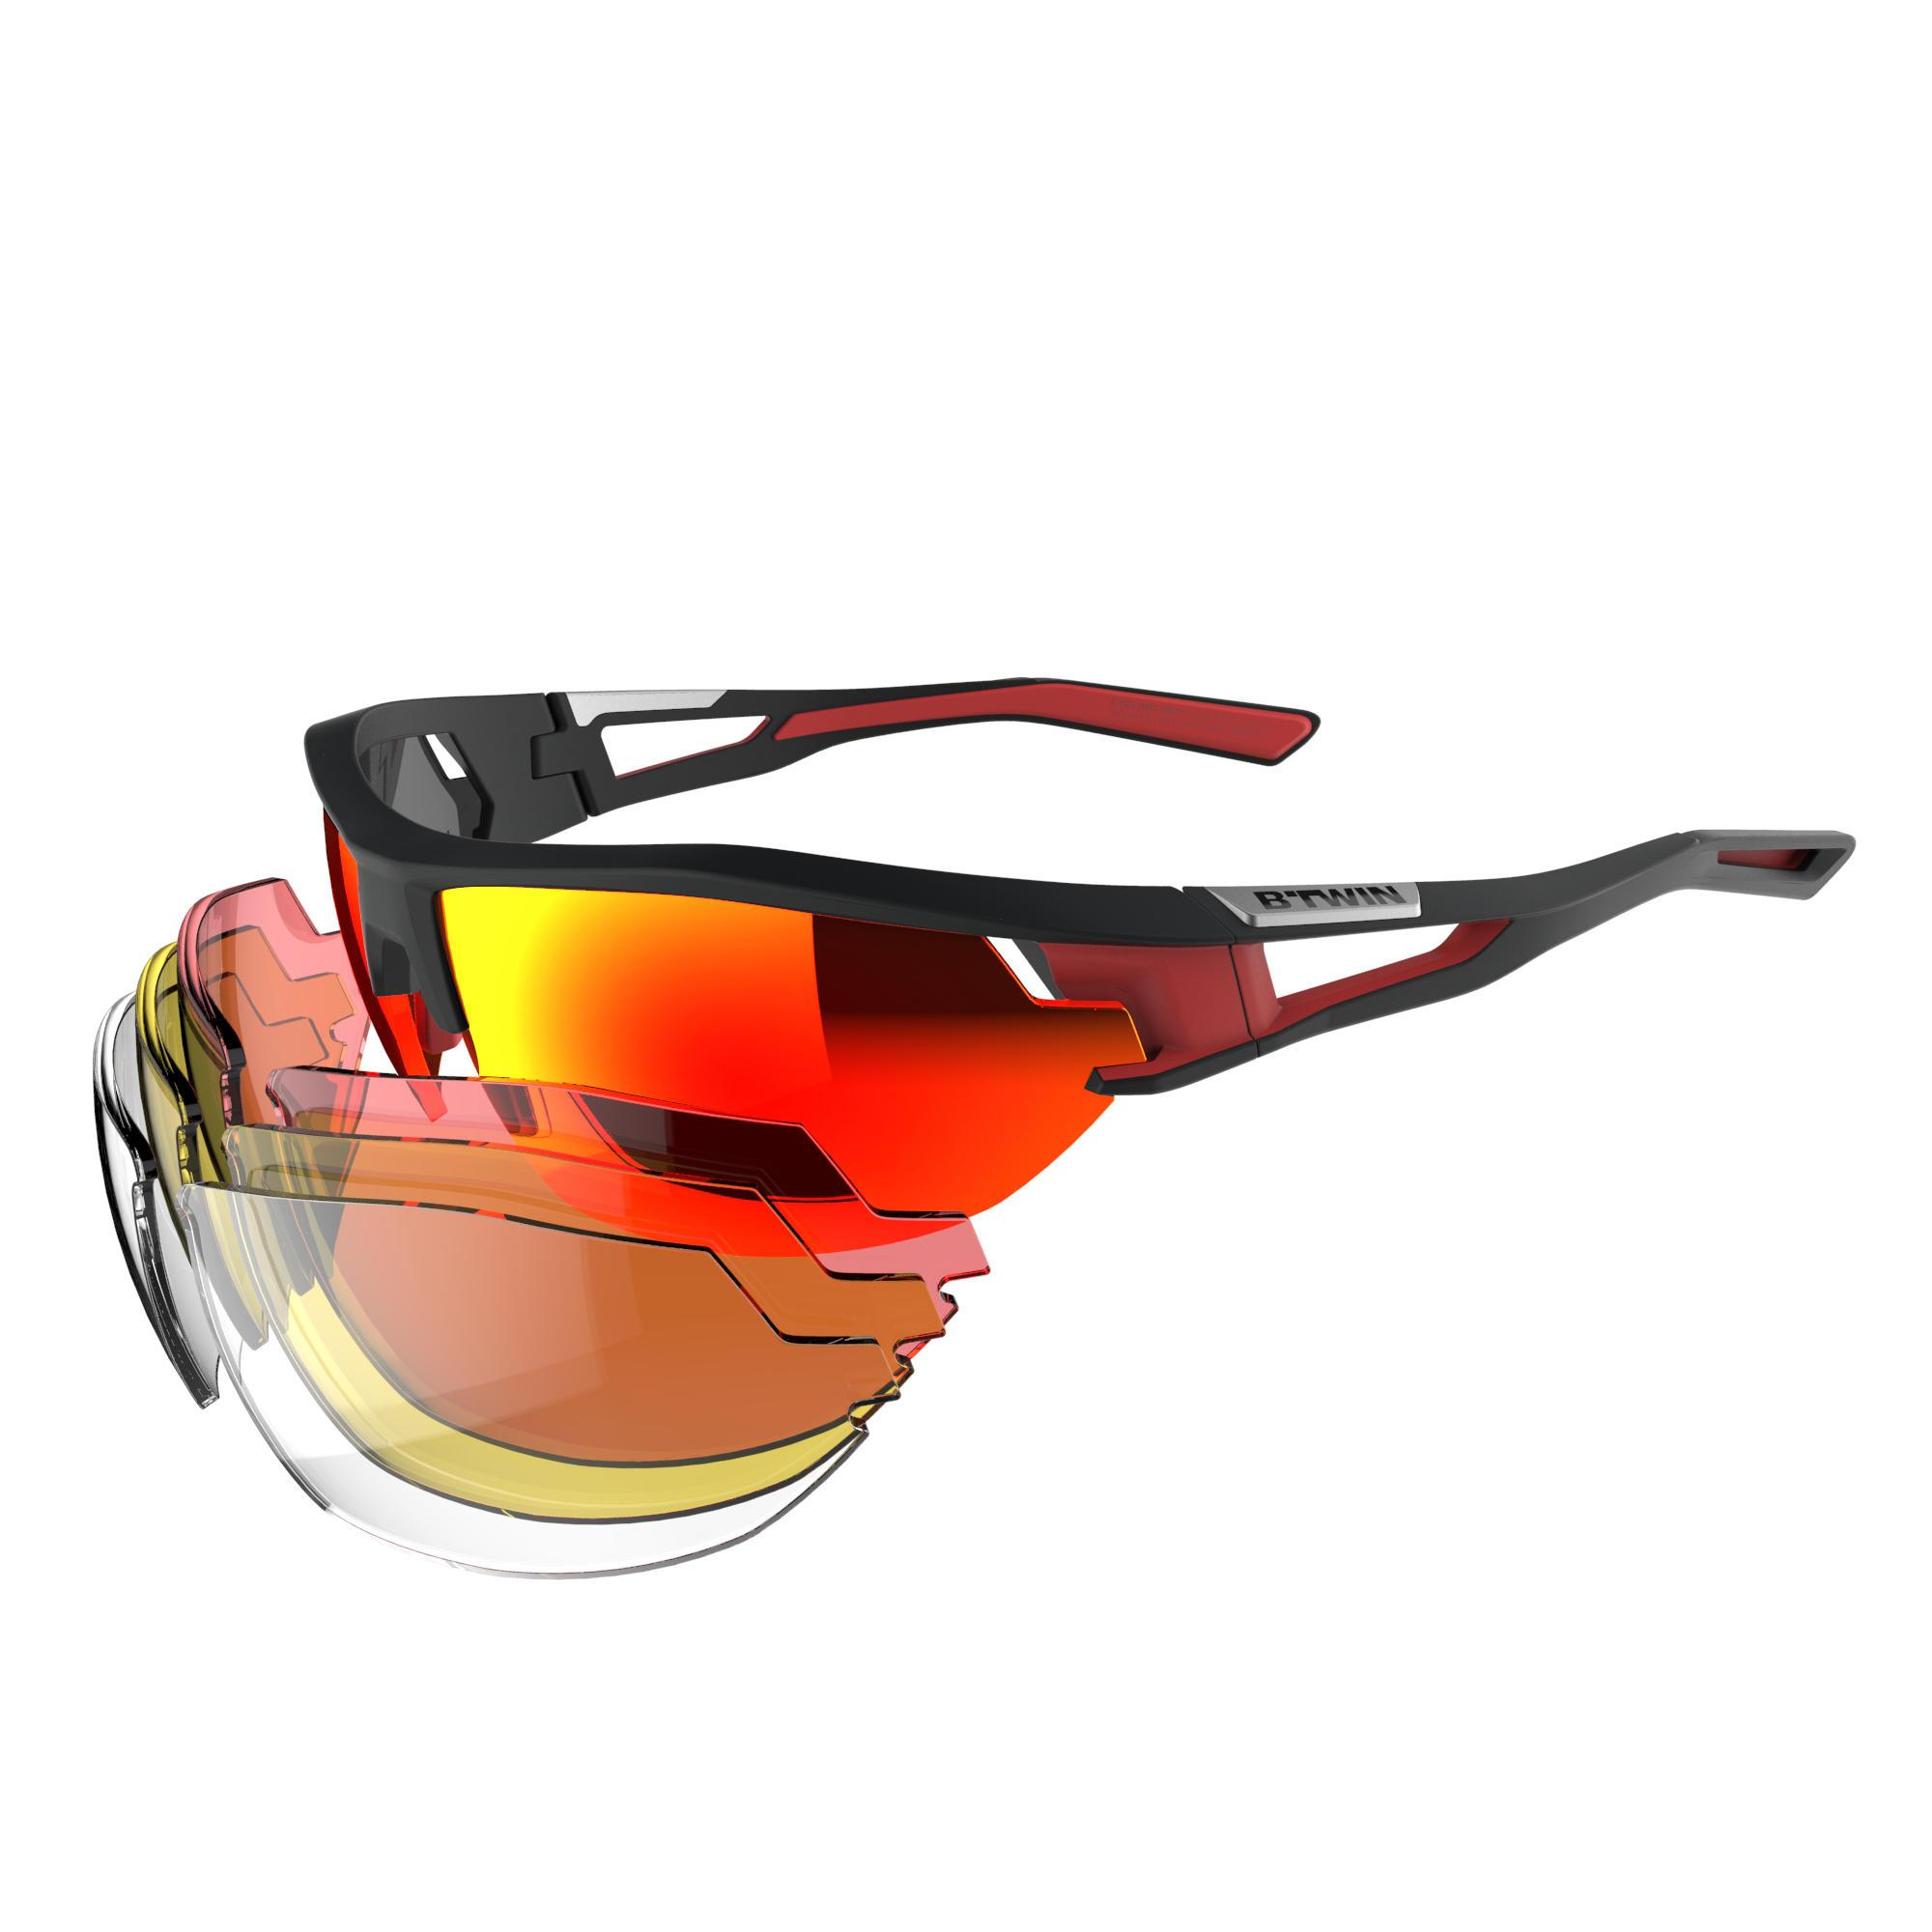 B'twin Fietsbril volwassenen Cycling 700 Red Pack - 4 verwisselbare glazen thumbnail